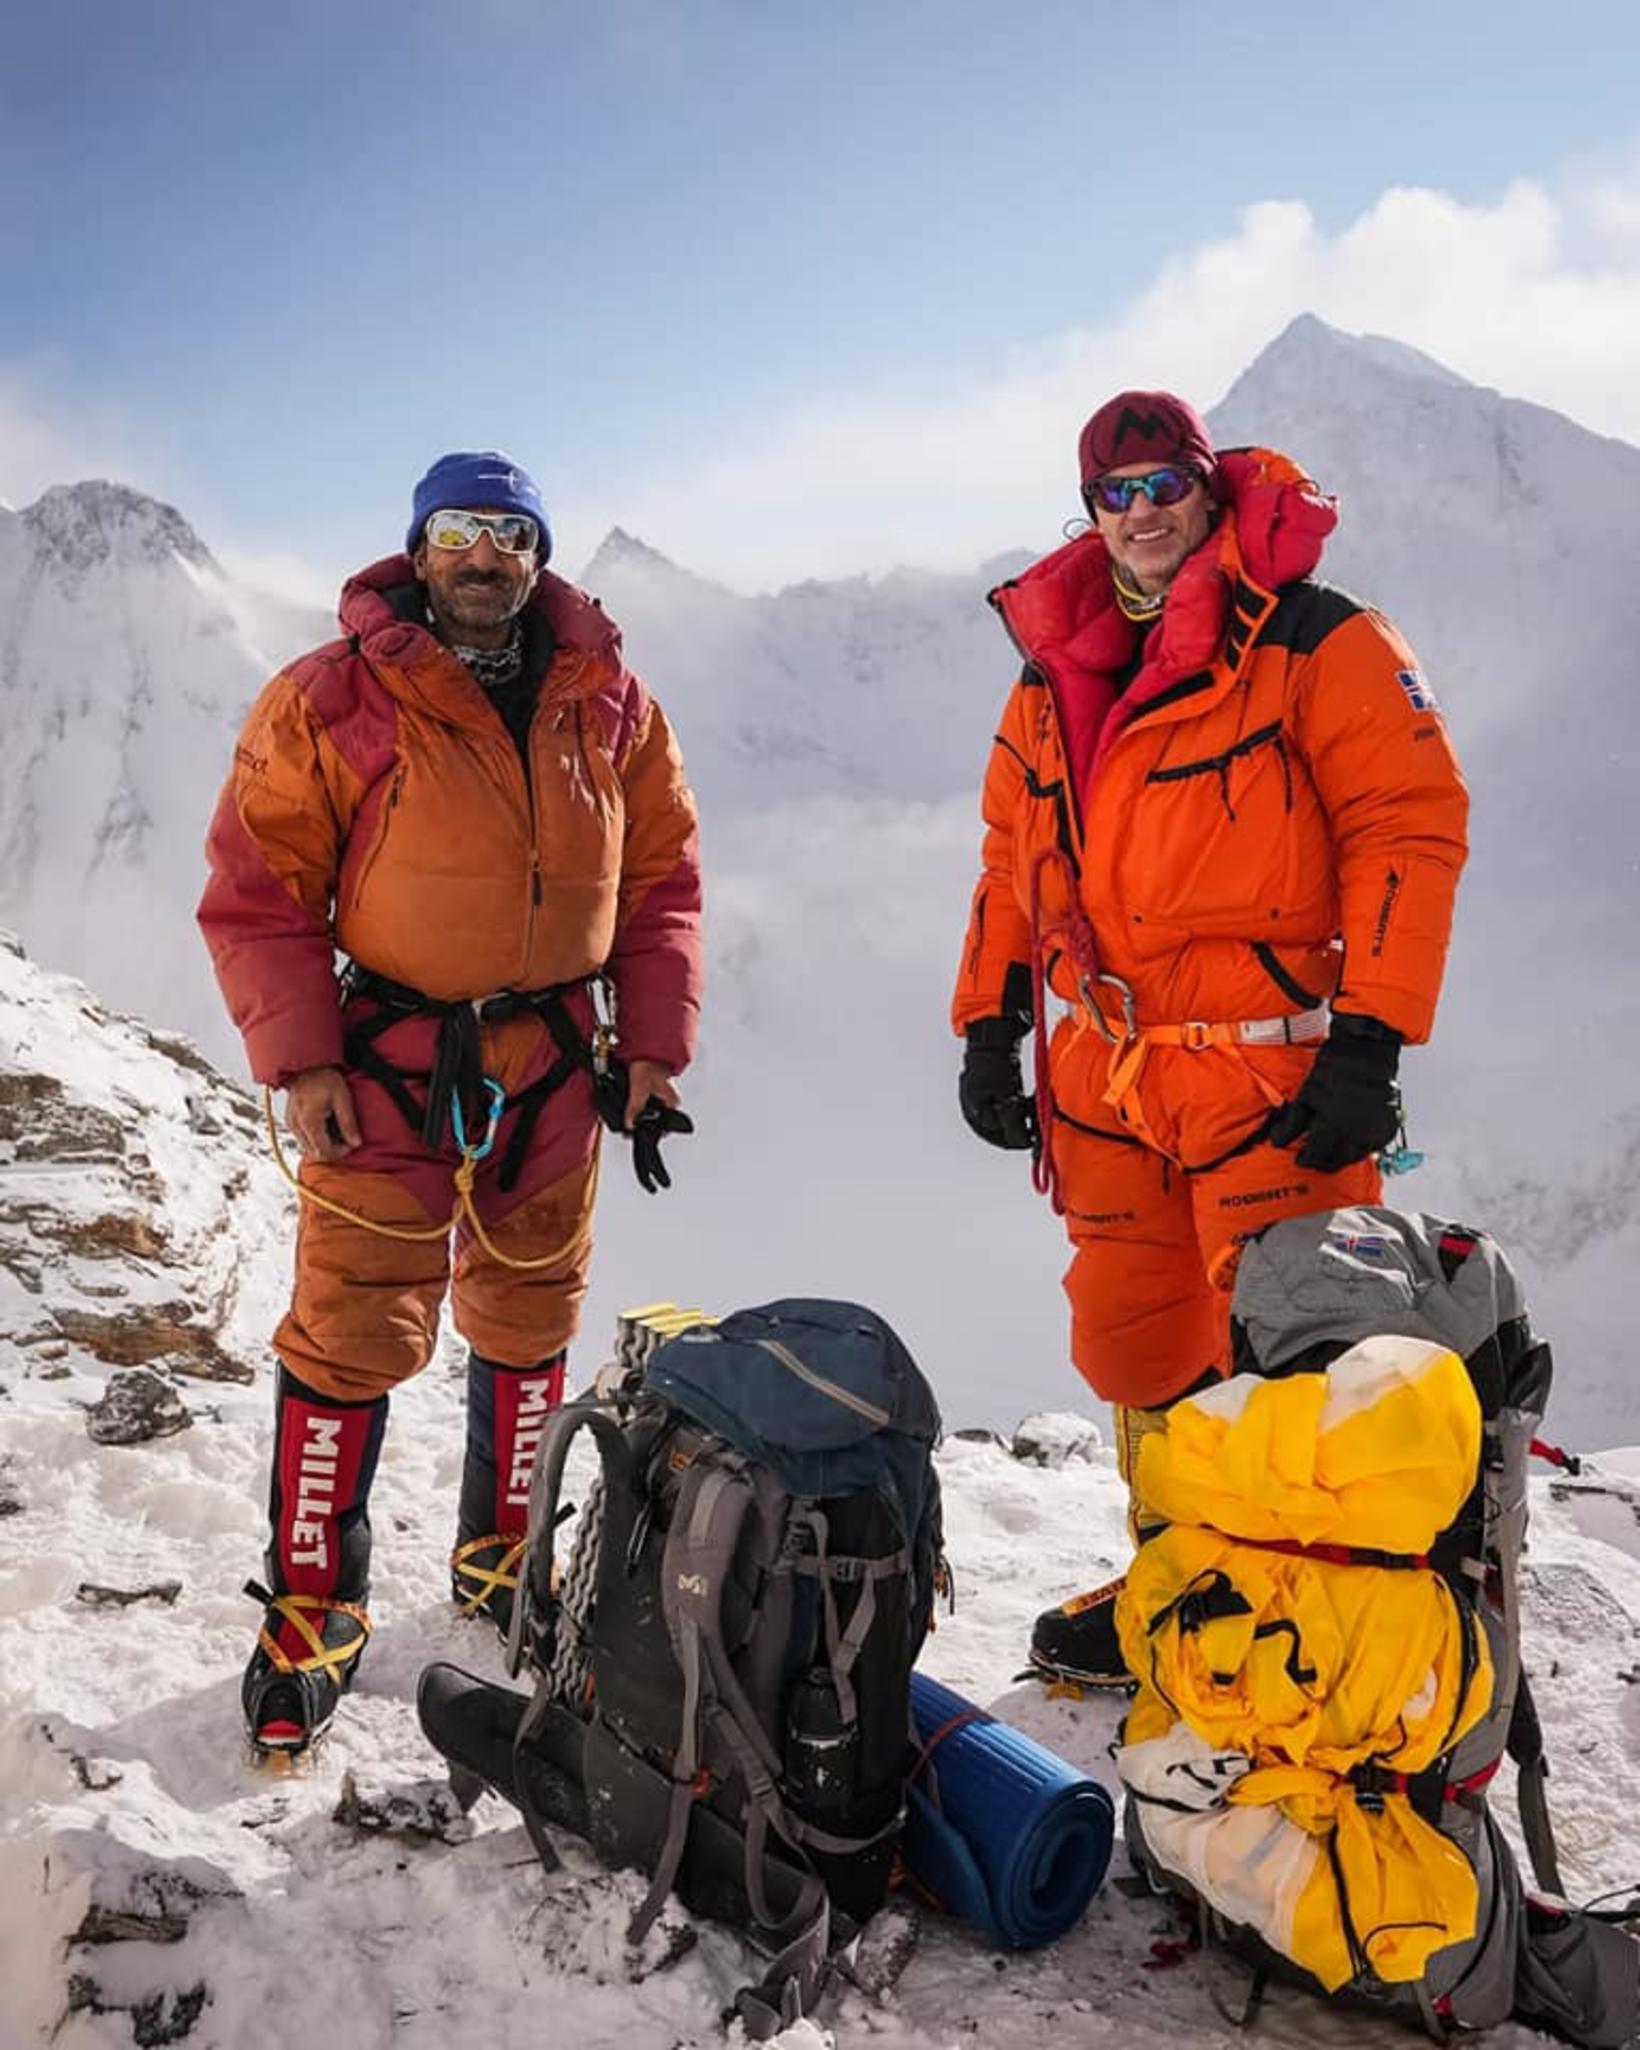 Muhammad Ali Sadpara, left, and John Snorri Sigurjónsson on K2 …